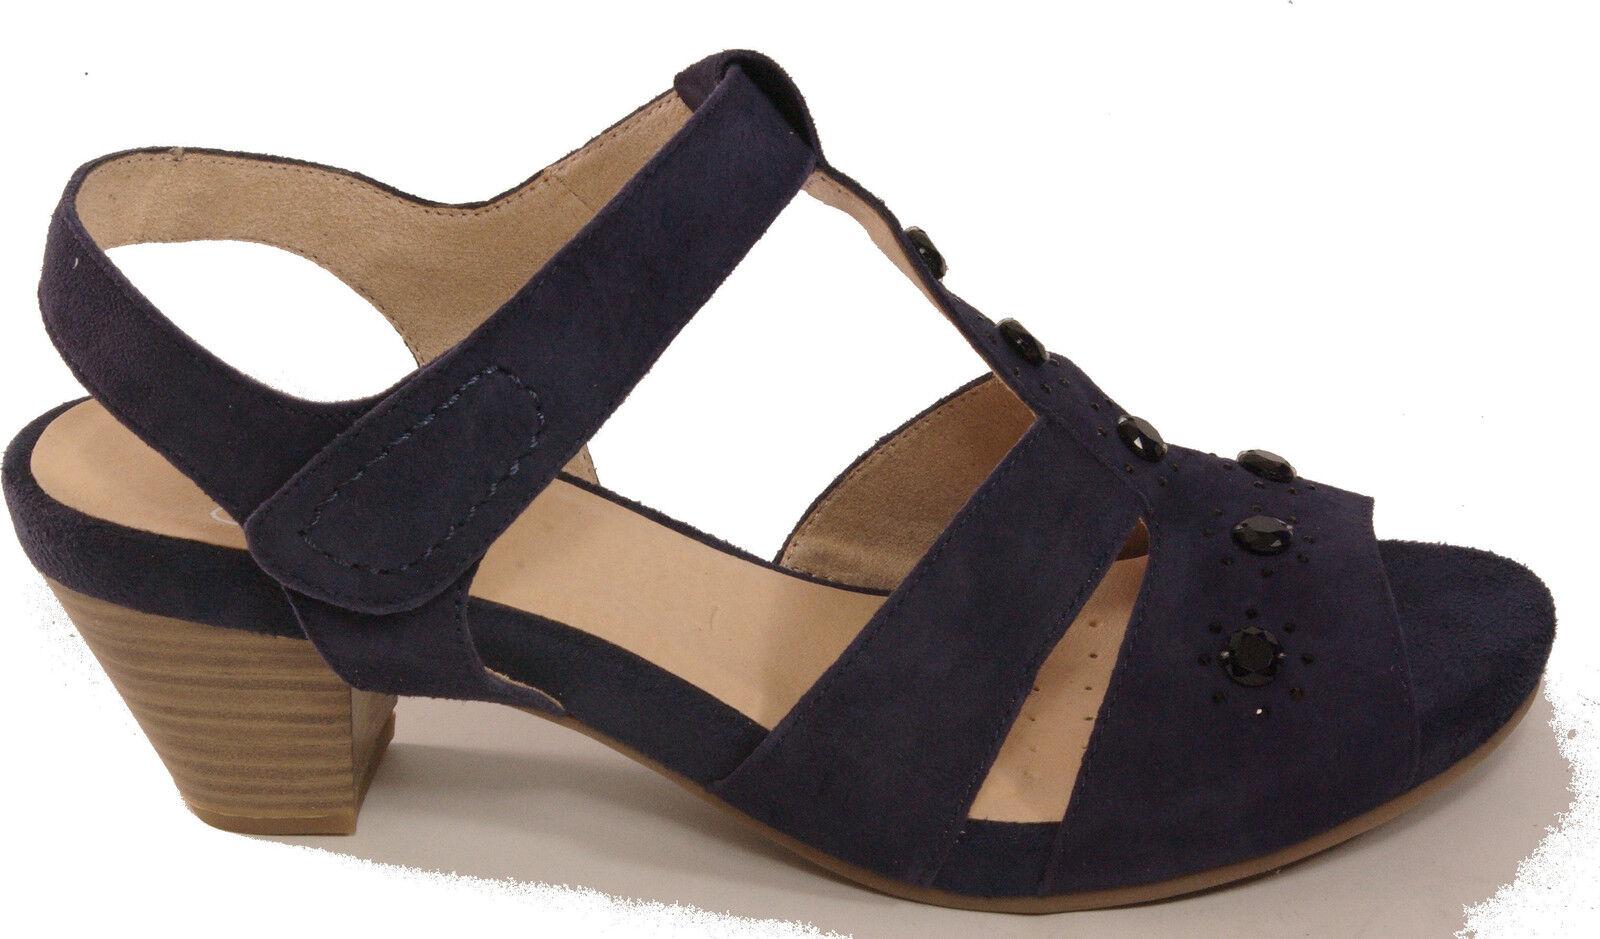 Caprice sandalias zapatos con tiras sandalias plataforma azul cuero genuino nuevo nobuck